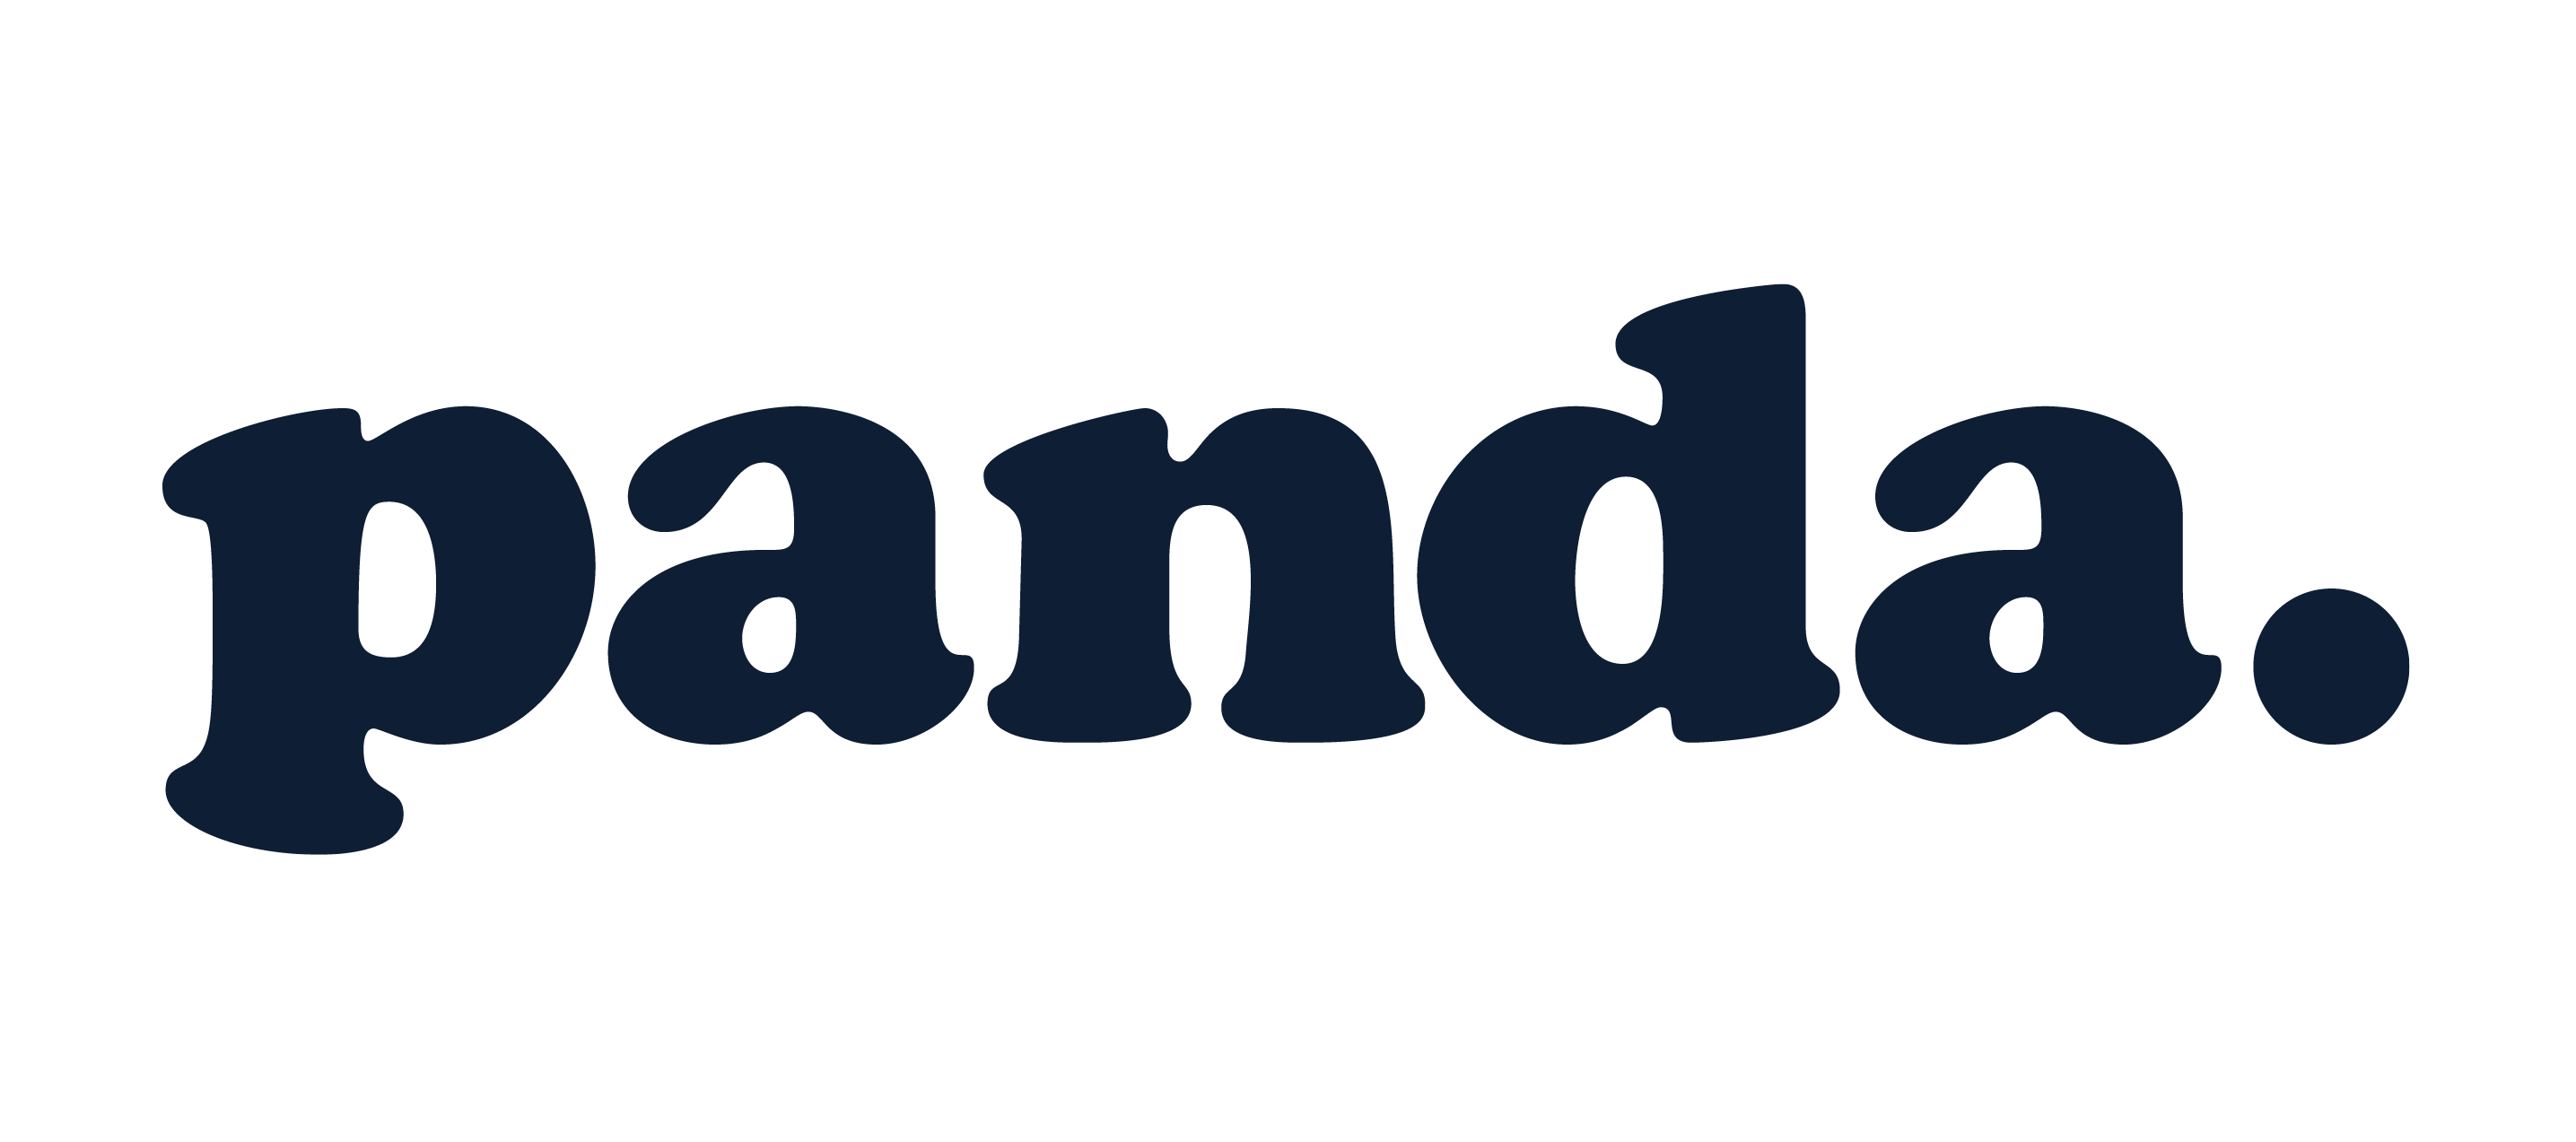 Panda_Web_logo-01